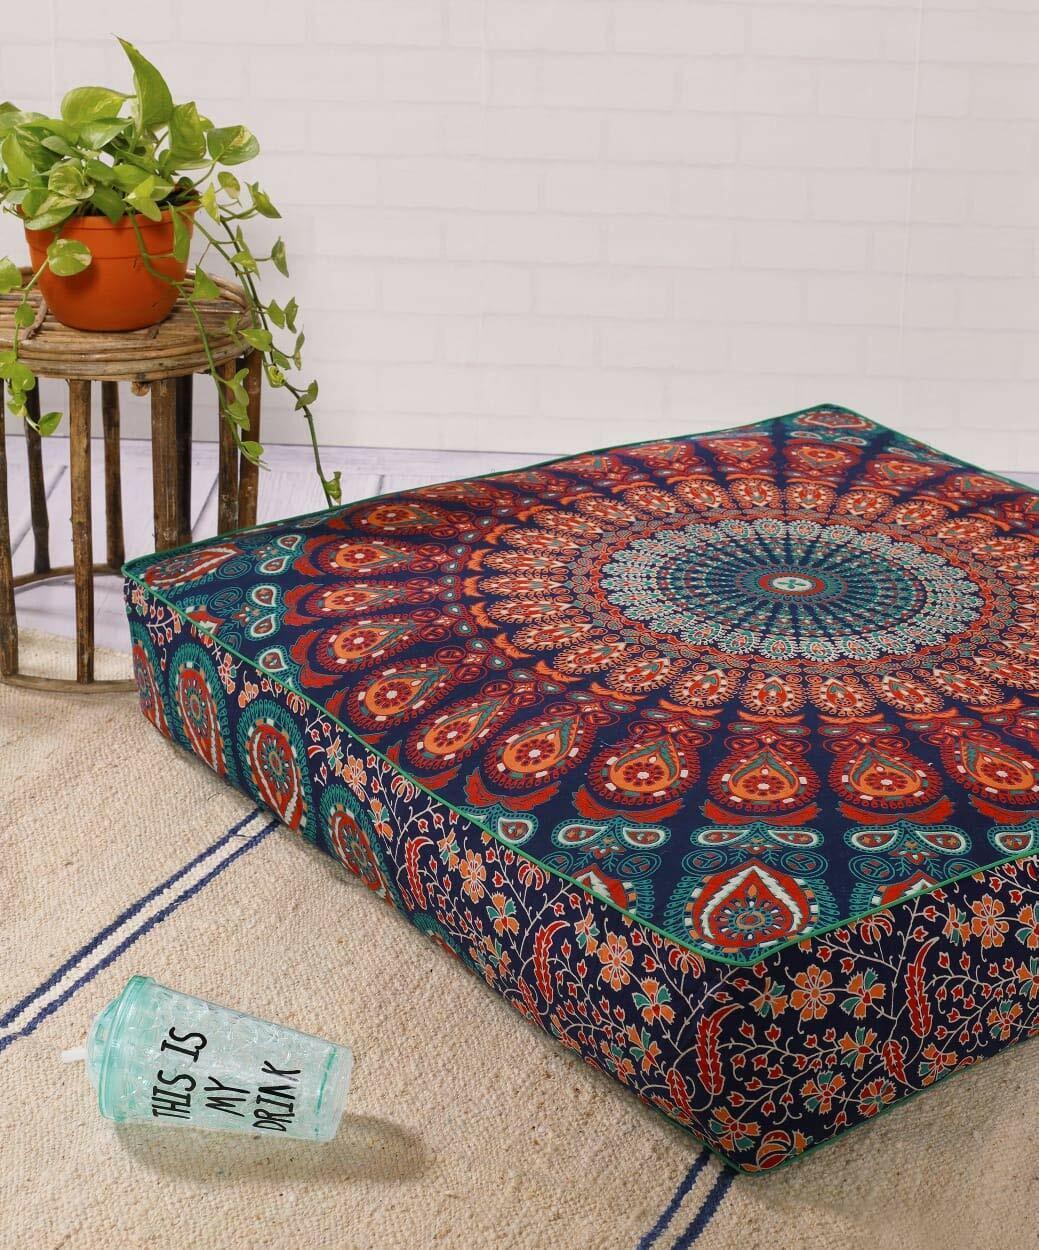 "Mandala Floor Pillow Cover, Square, 35"" X 35"", Ottoman Pouf,"